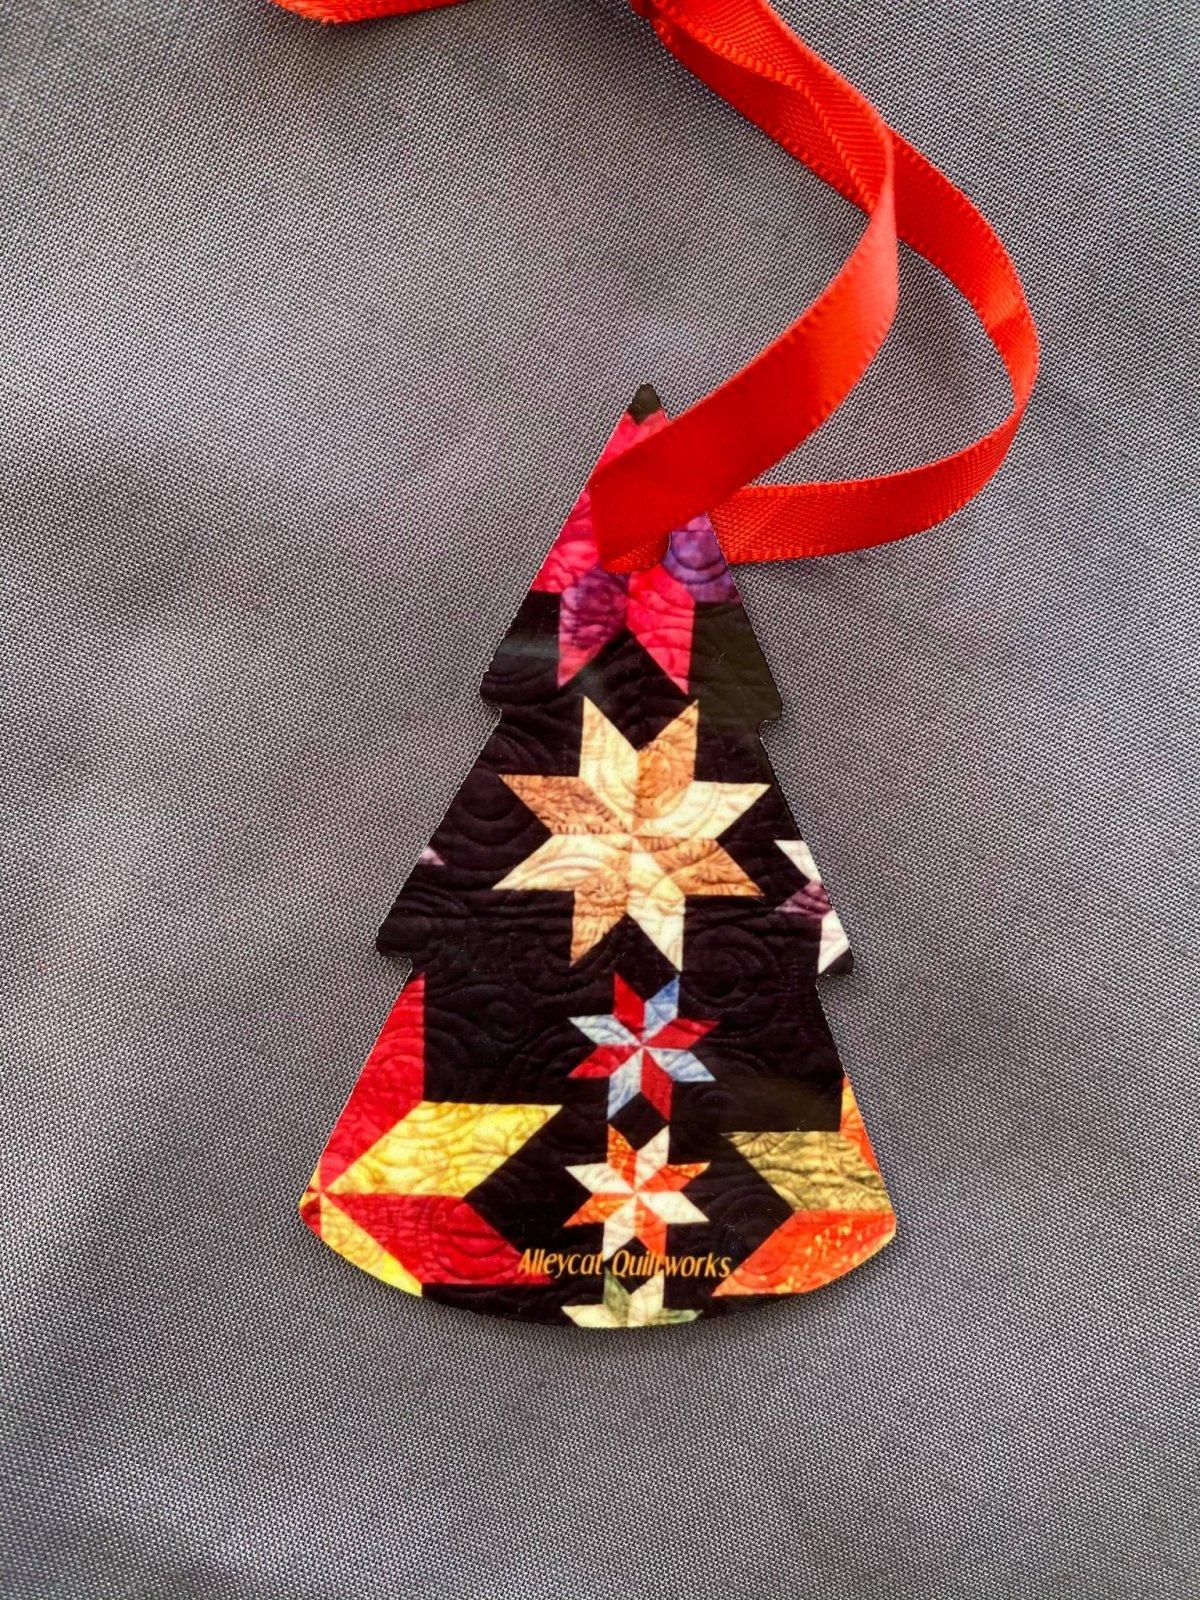 Metal Ornament - Constellation - Tree